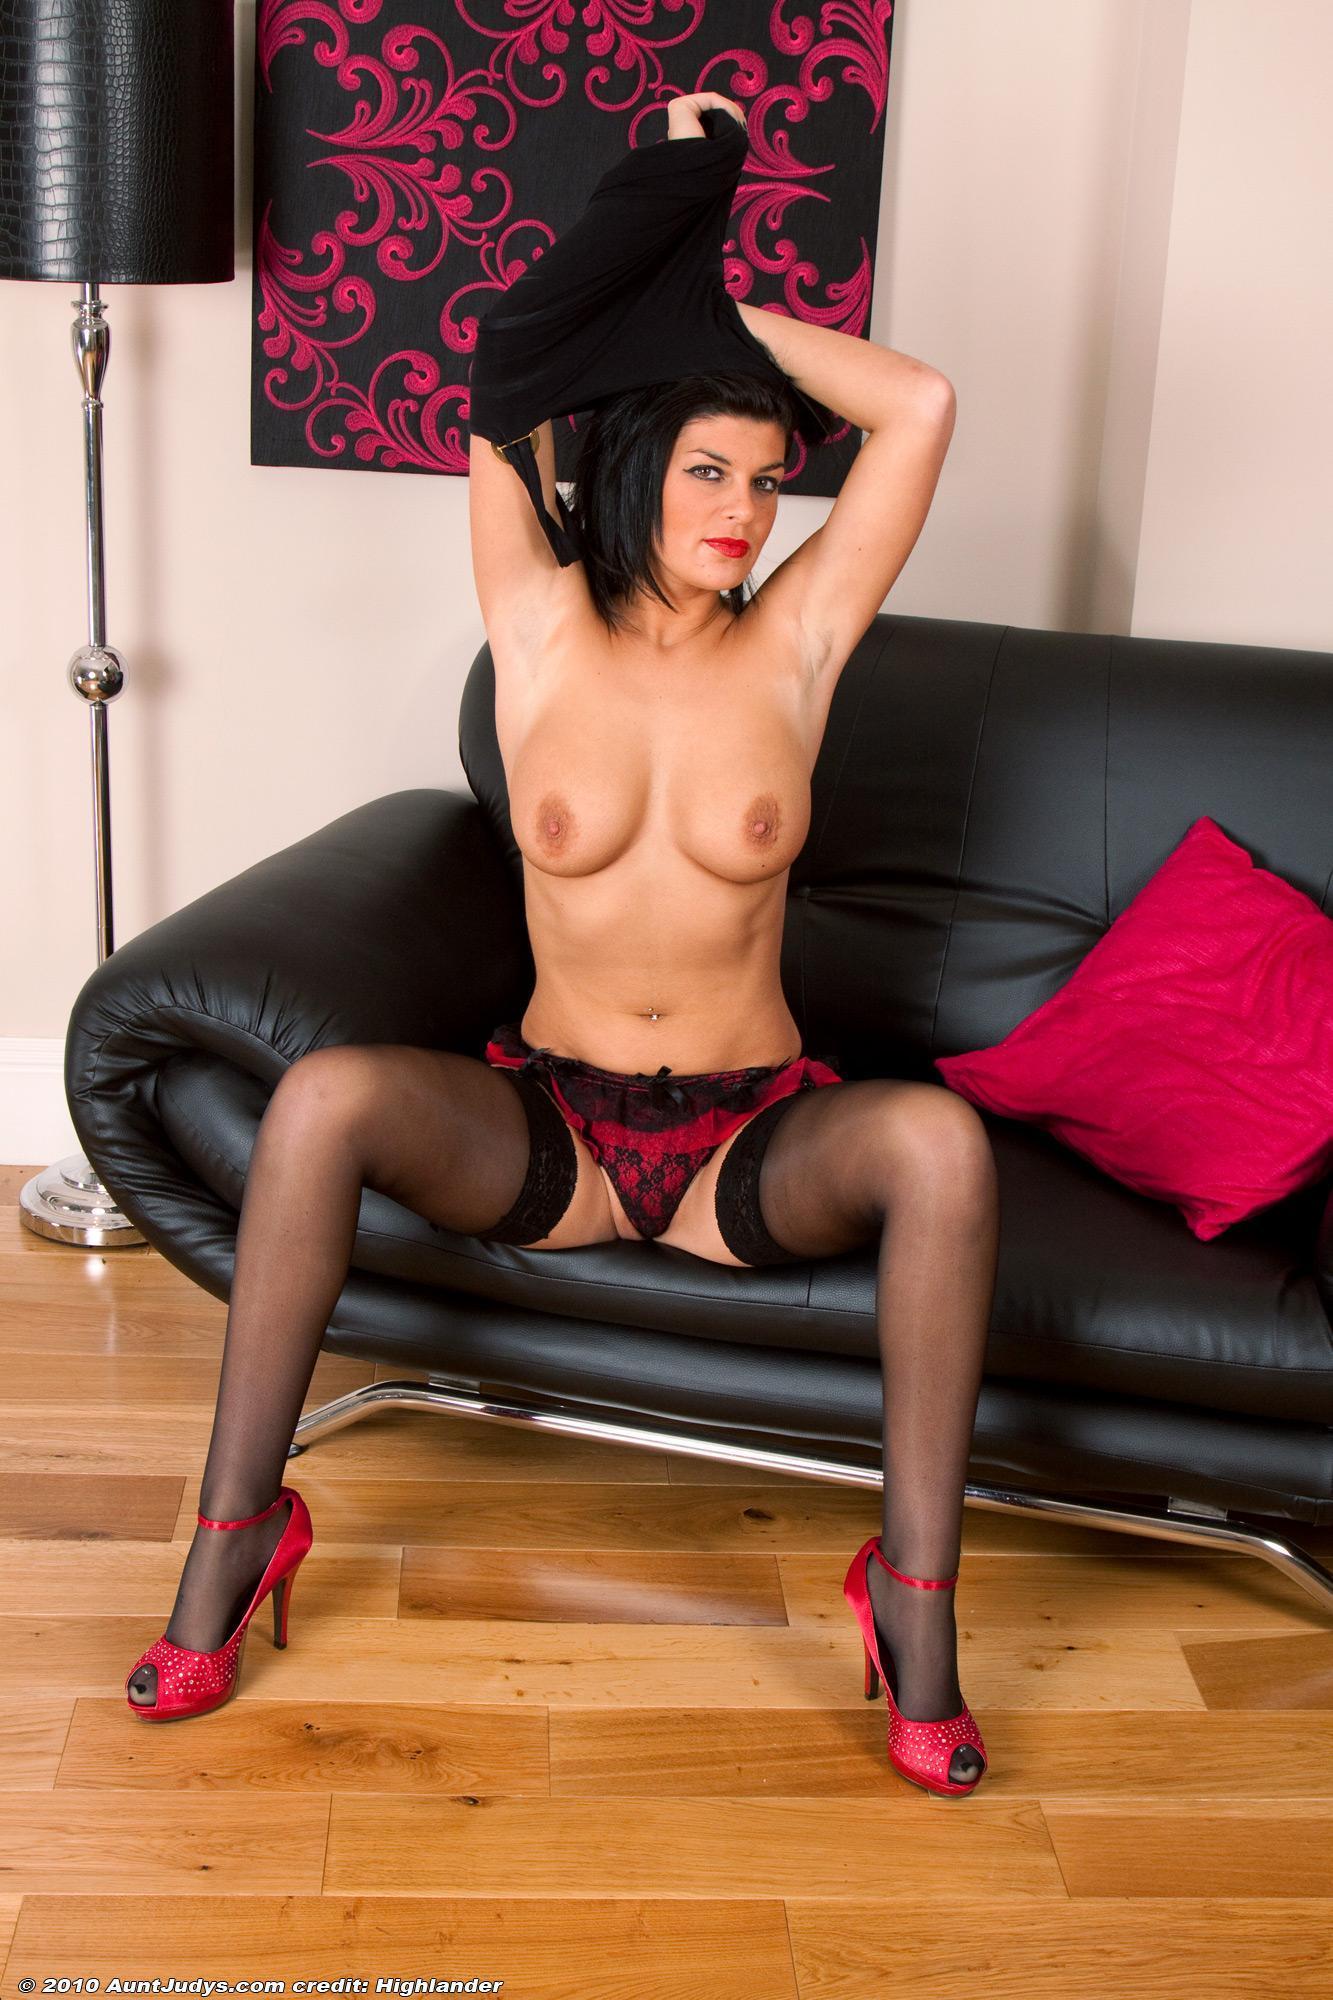 Elder black-haired model revealing ideal boobies in wondrous black hose and high heels